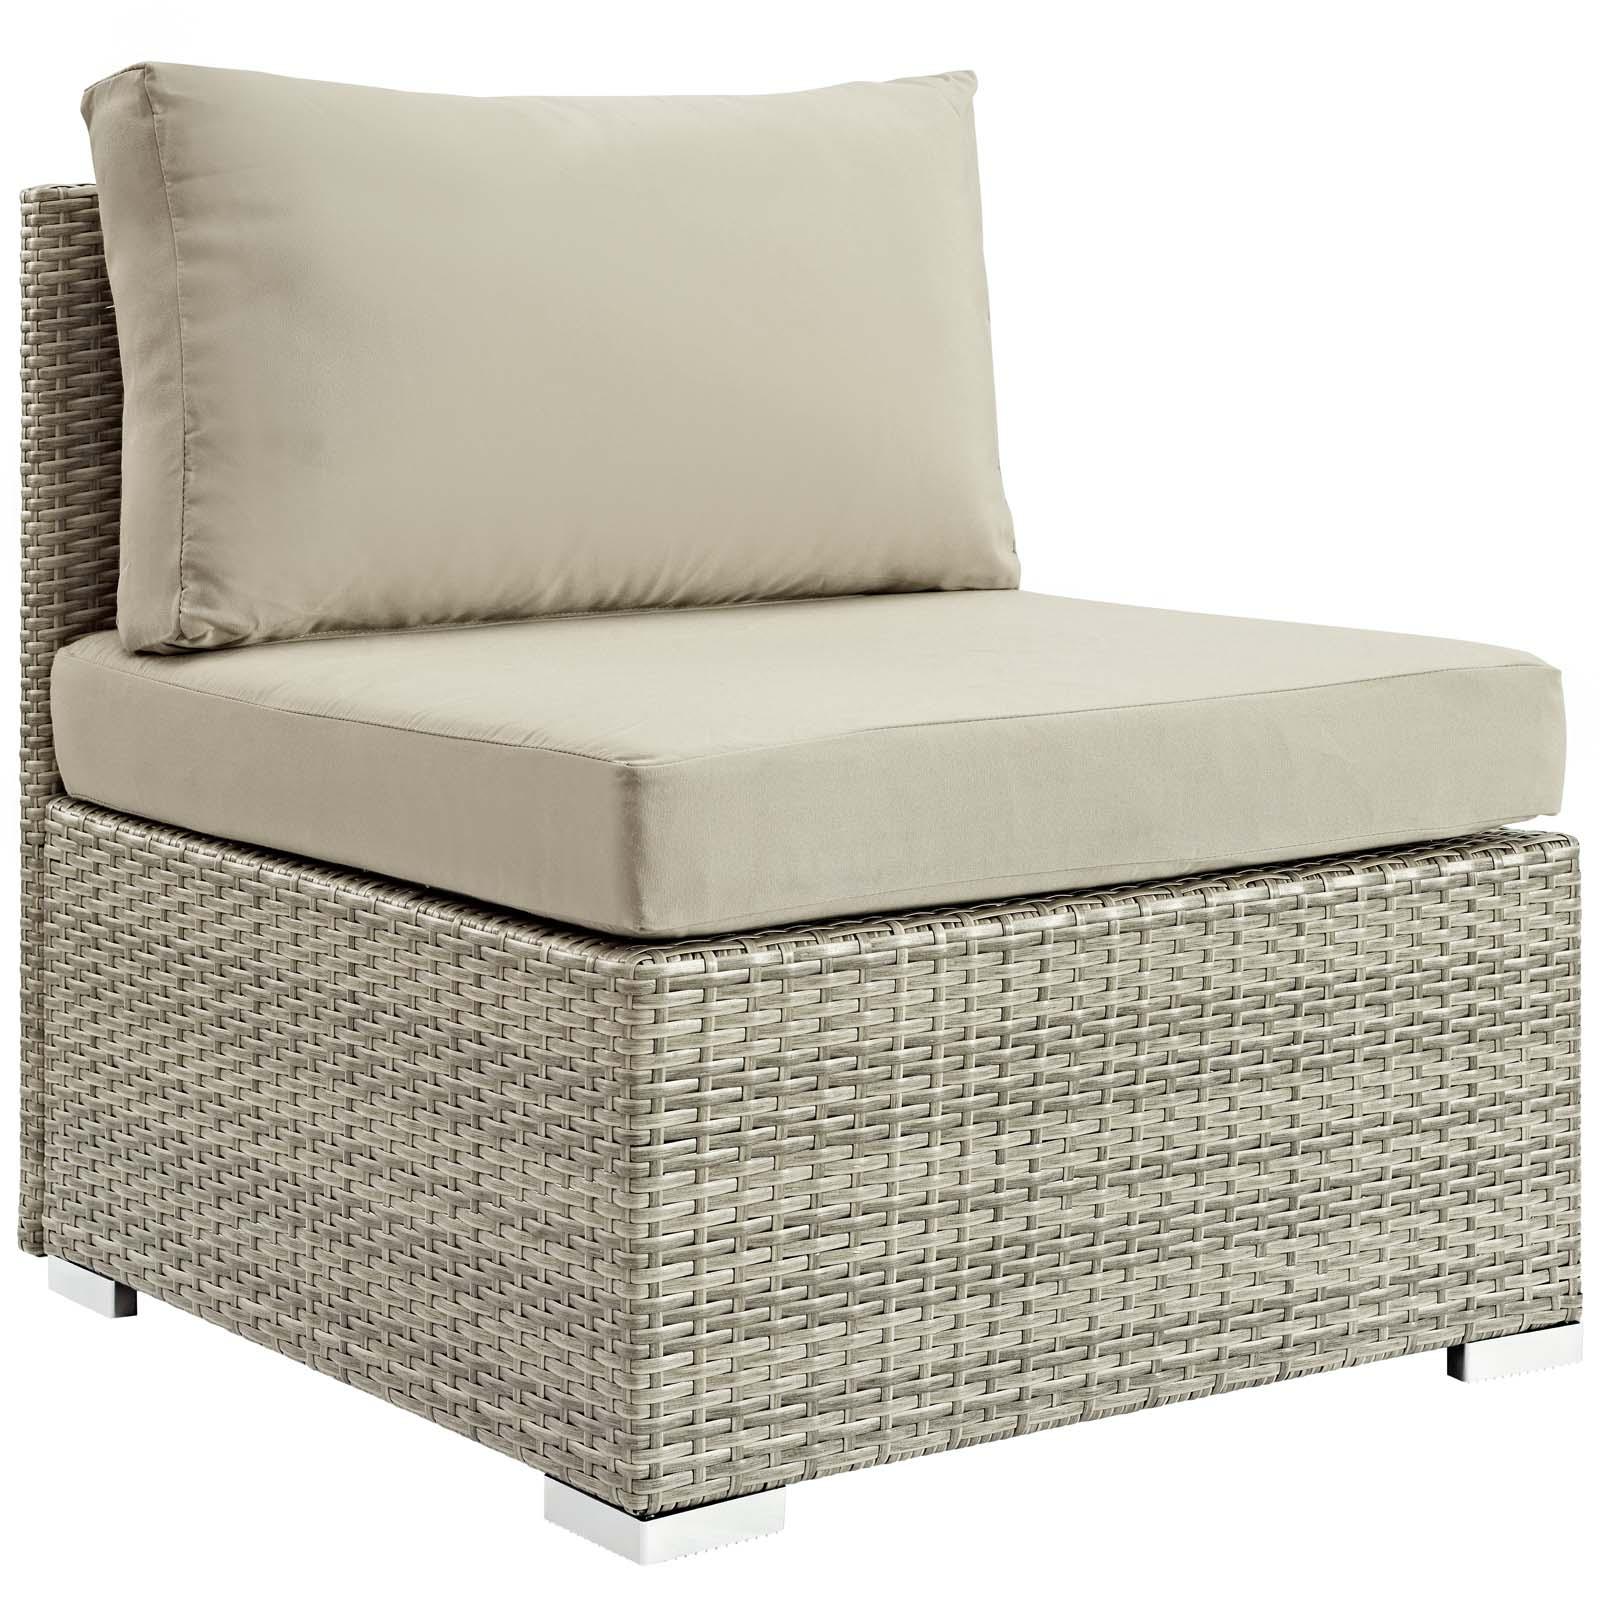 repose sunbrella fabric outdoor patio armless chair